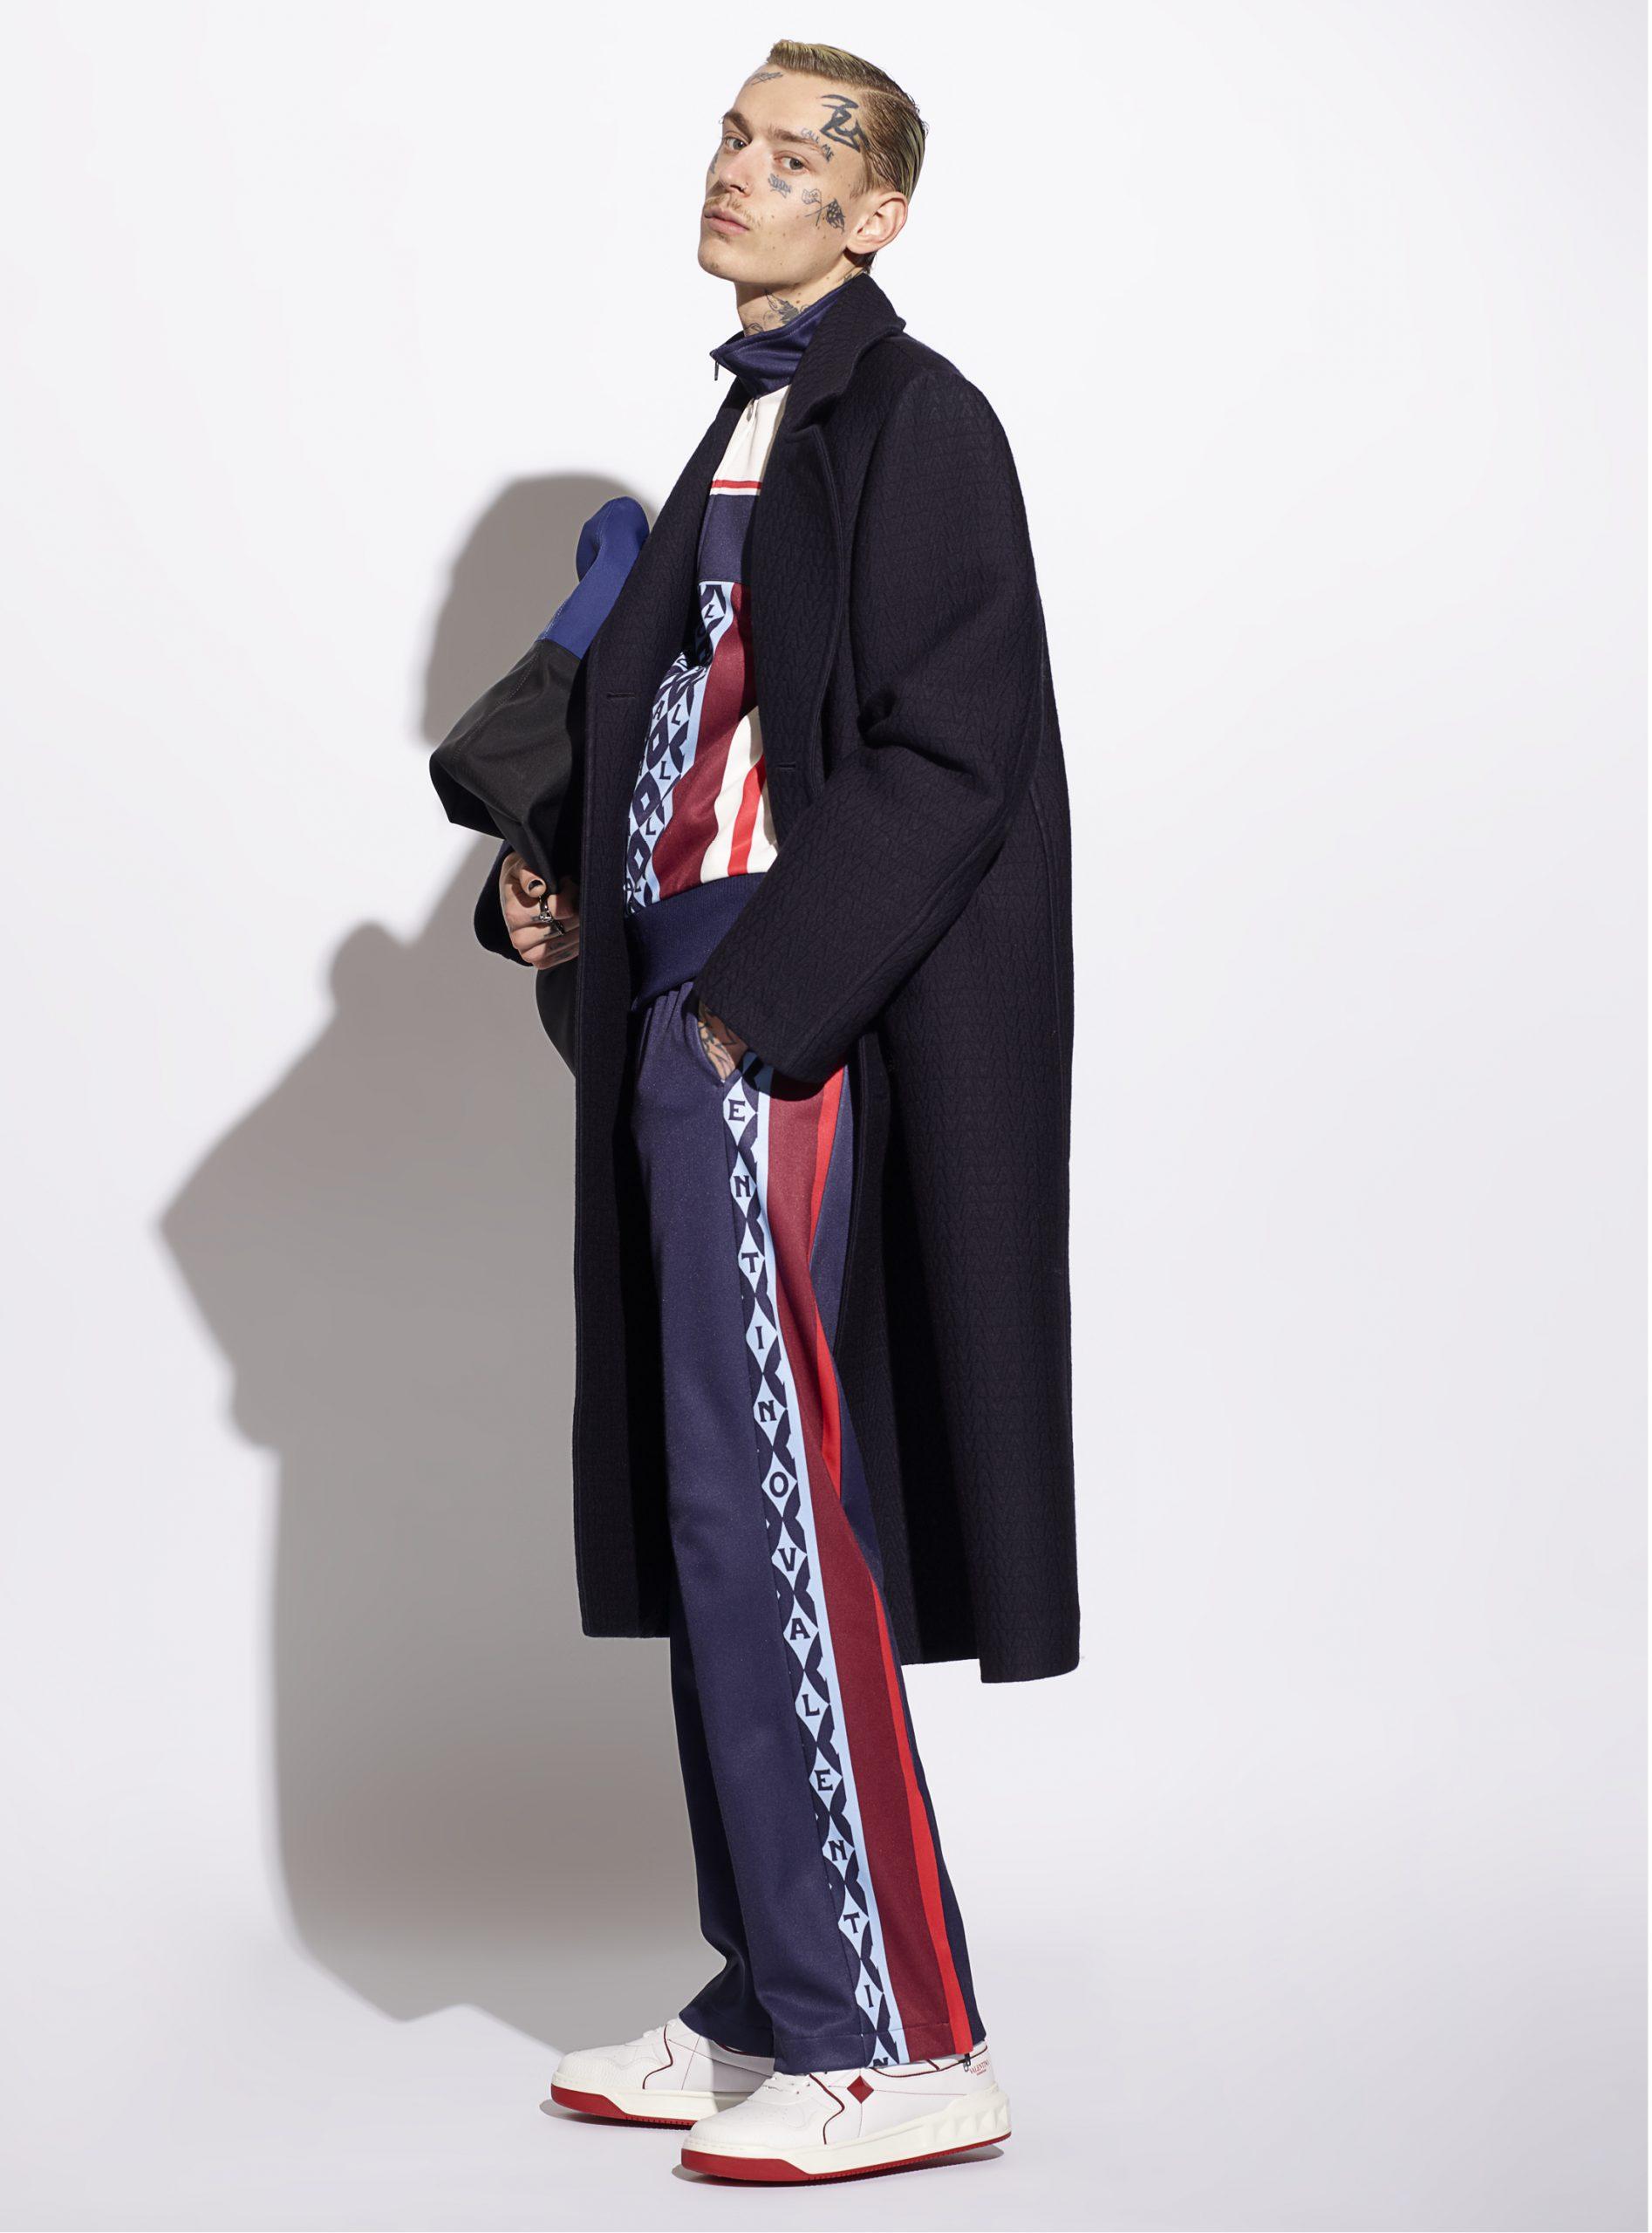 Valentino - Fall 21 - Sneaker One Stud - Ph Courtesy Maison Valentino